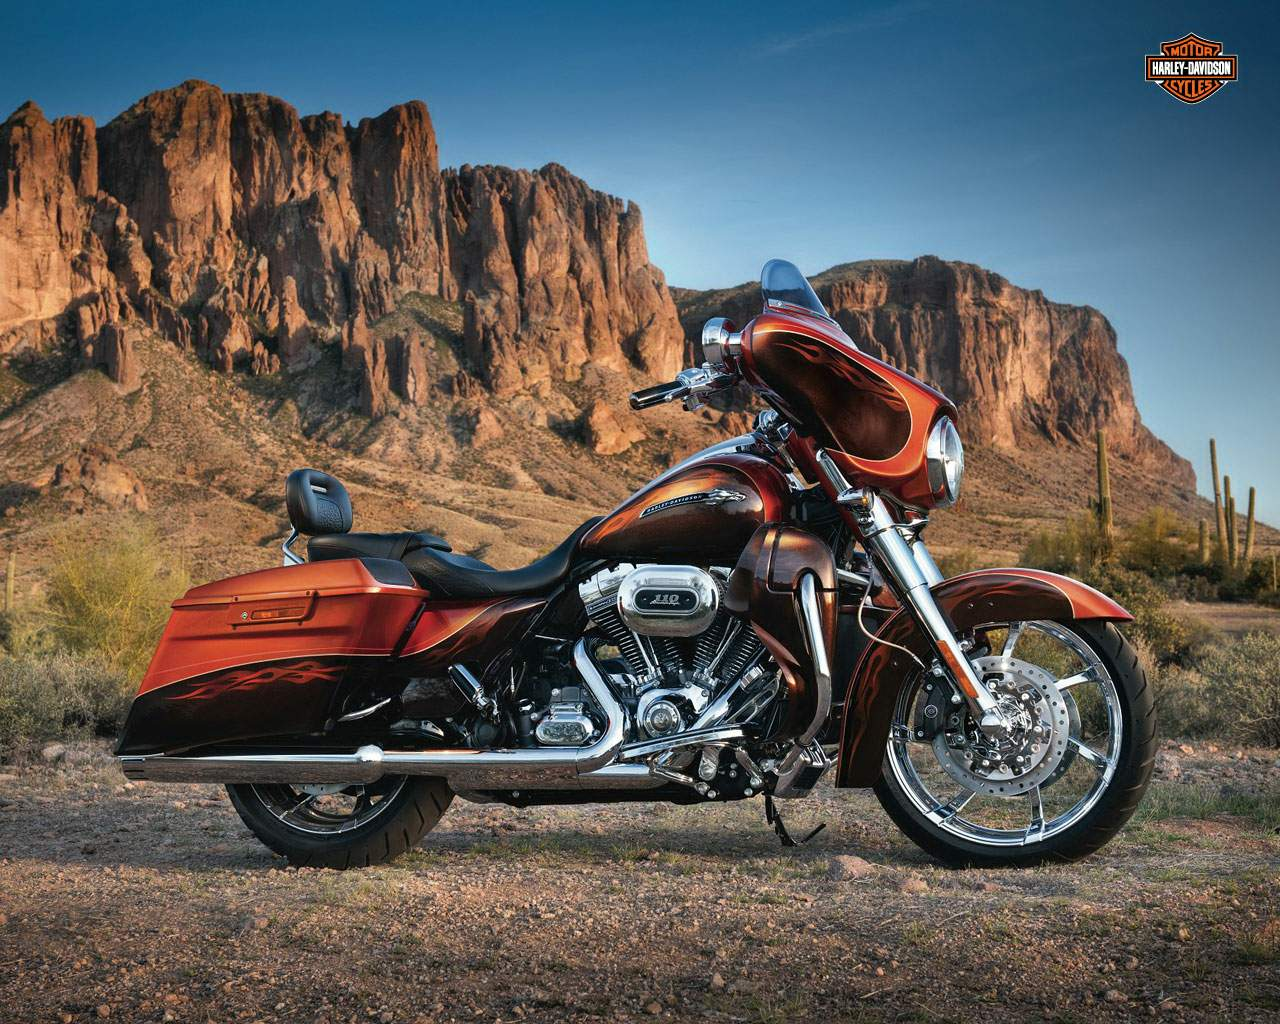 Harley Davidson Flhx Se Cvo Street Glide 2012